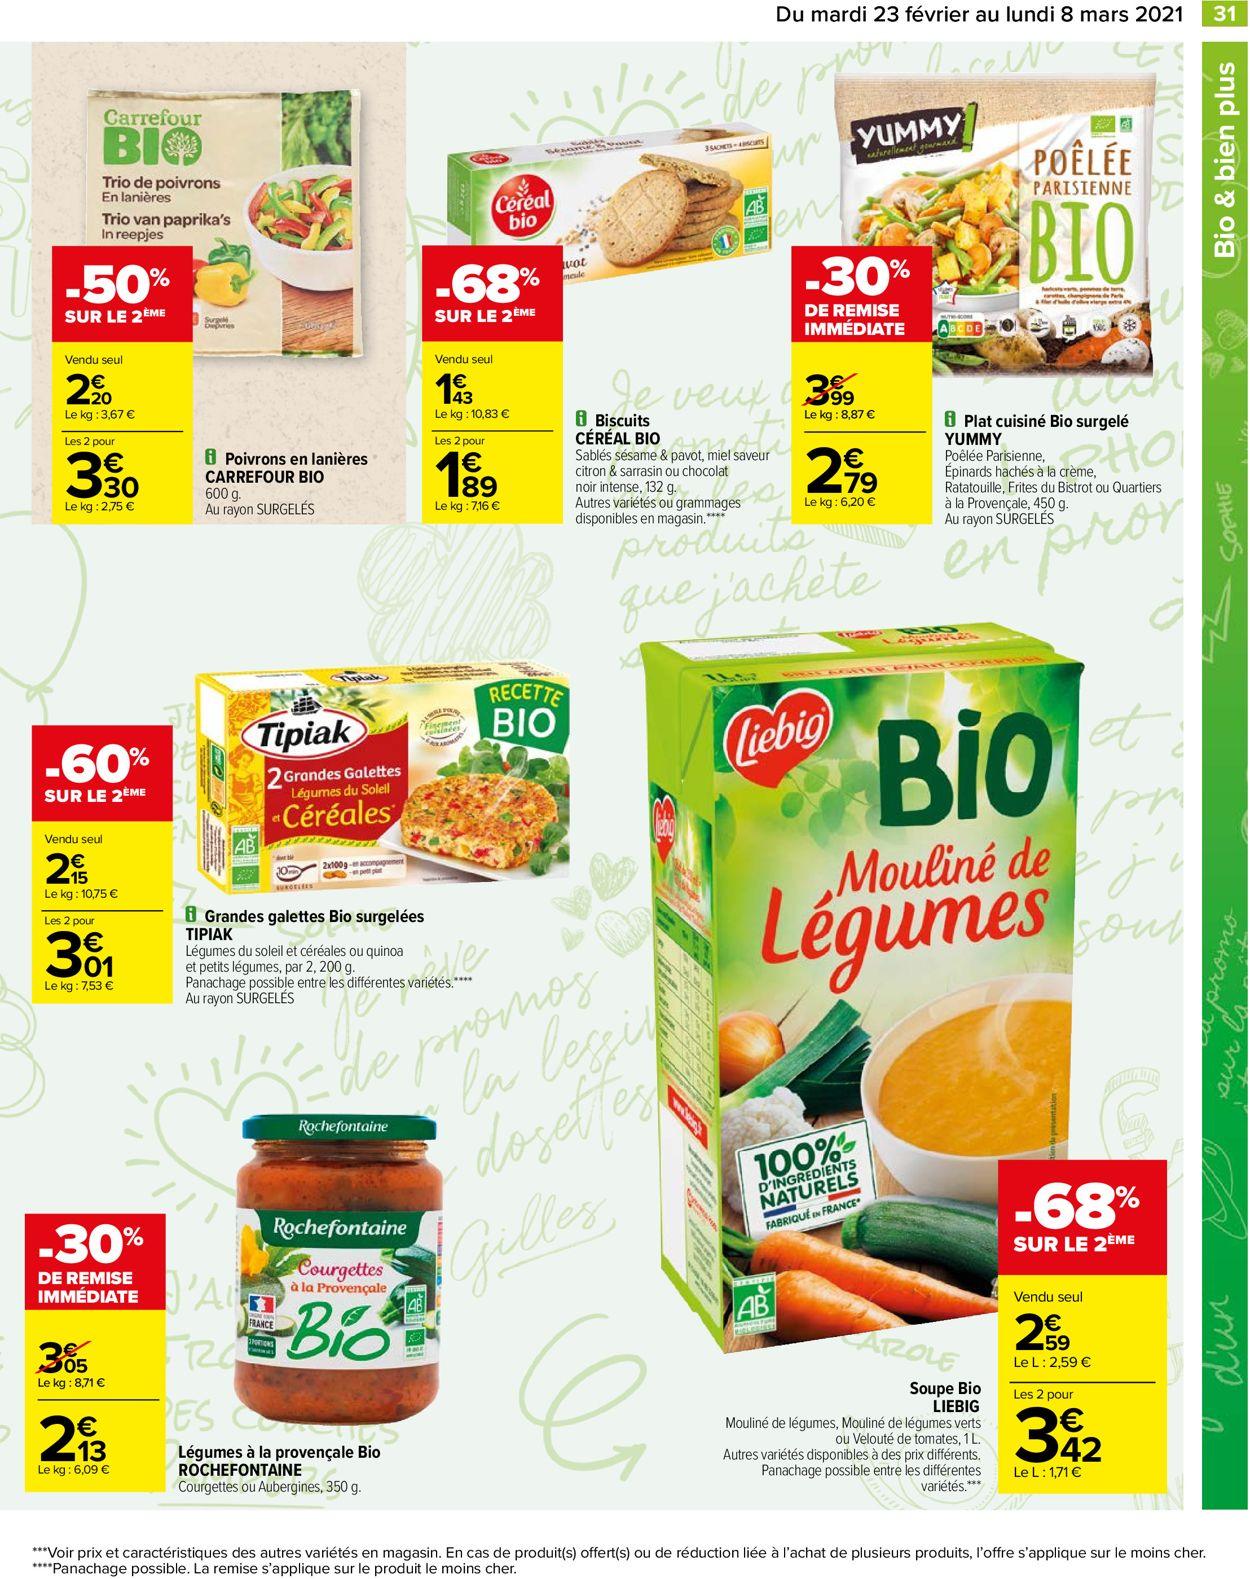 Carrefour Catalogue - 23.02-08.03.2021 (Page 31)